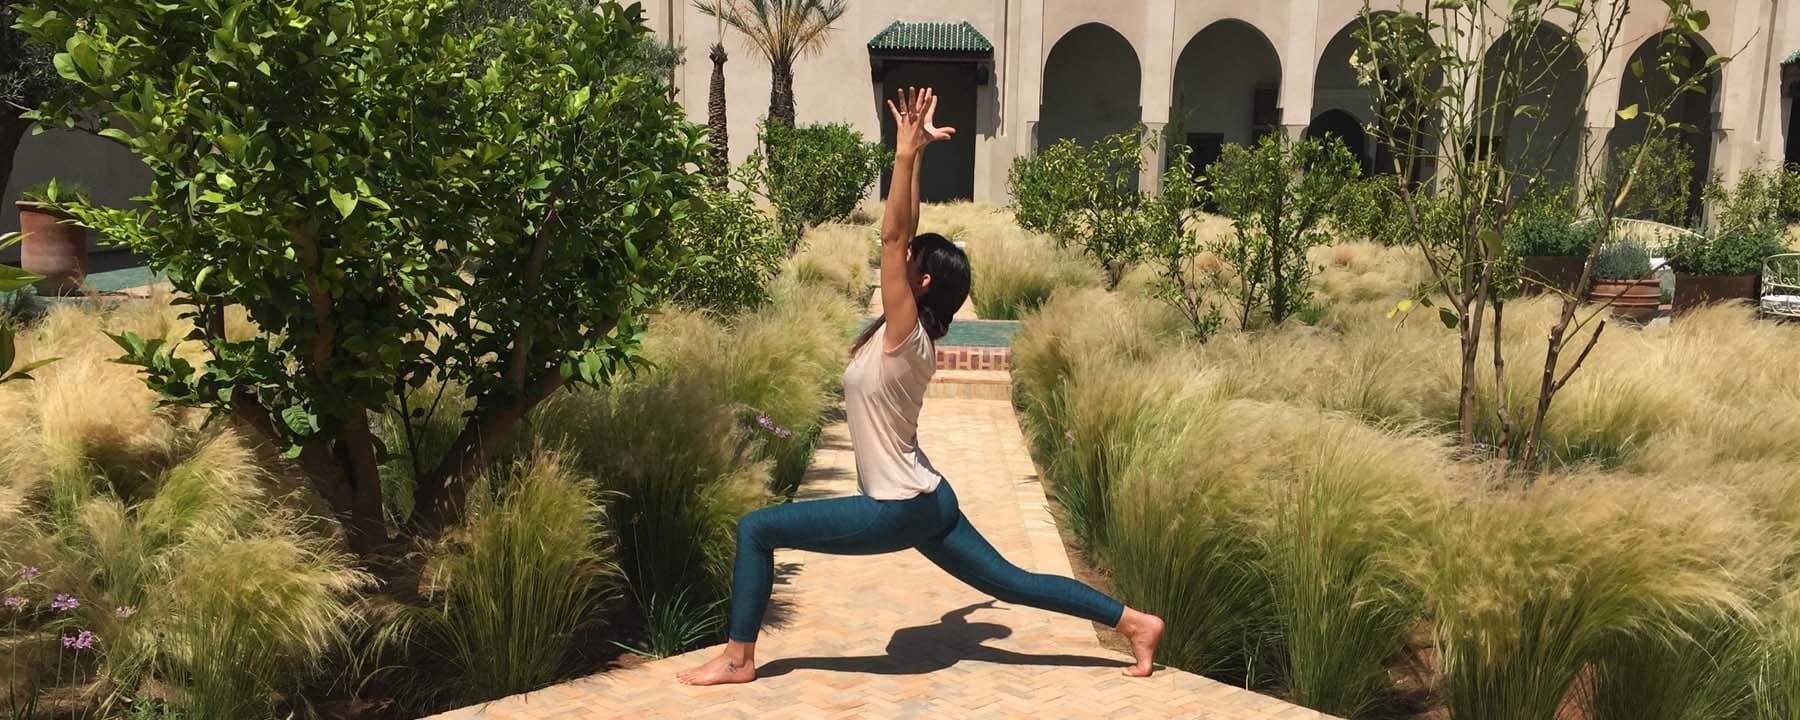 Marvelous Yoga U0026 Green Marrakech_Source NOSADE